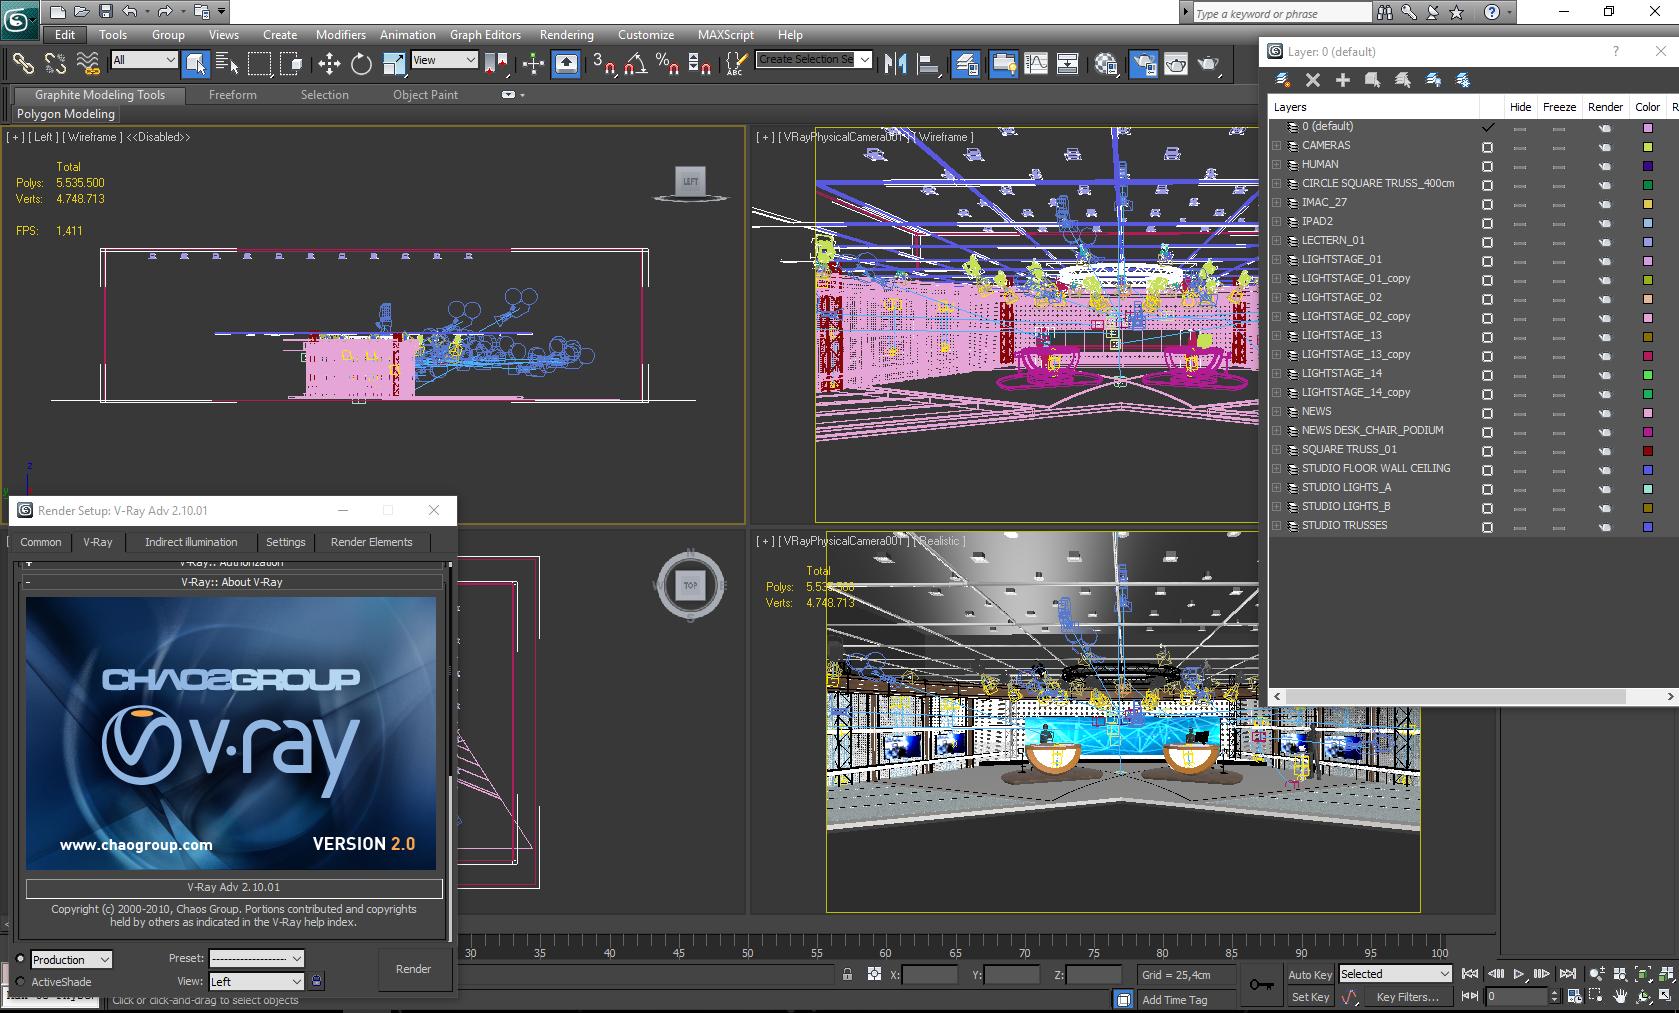 виртуал телевизийн студи цуглуулга vol 6 3d загвар max dxf dwg fbx obj 223415